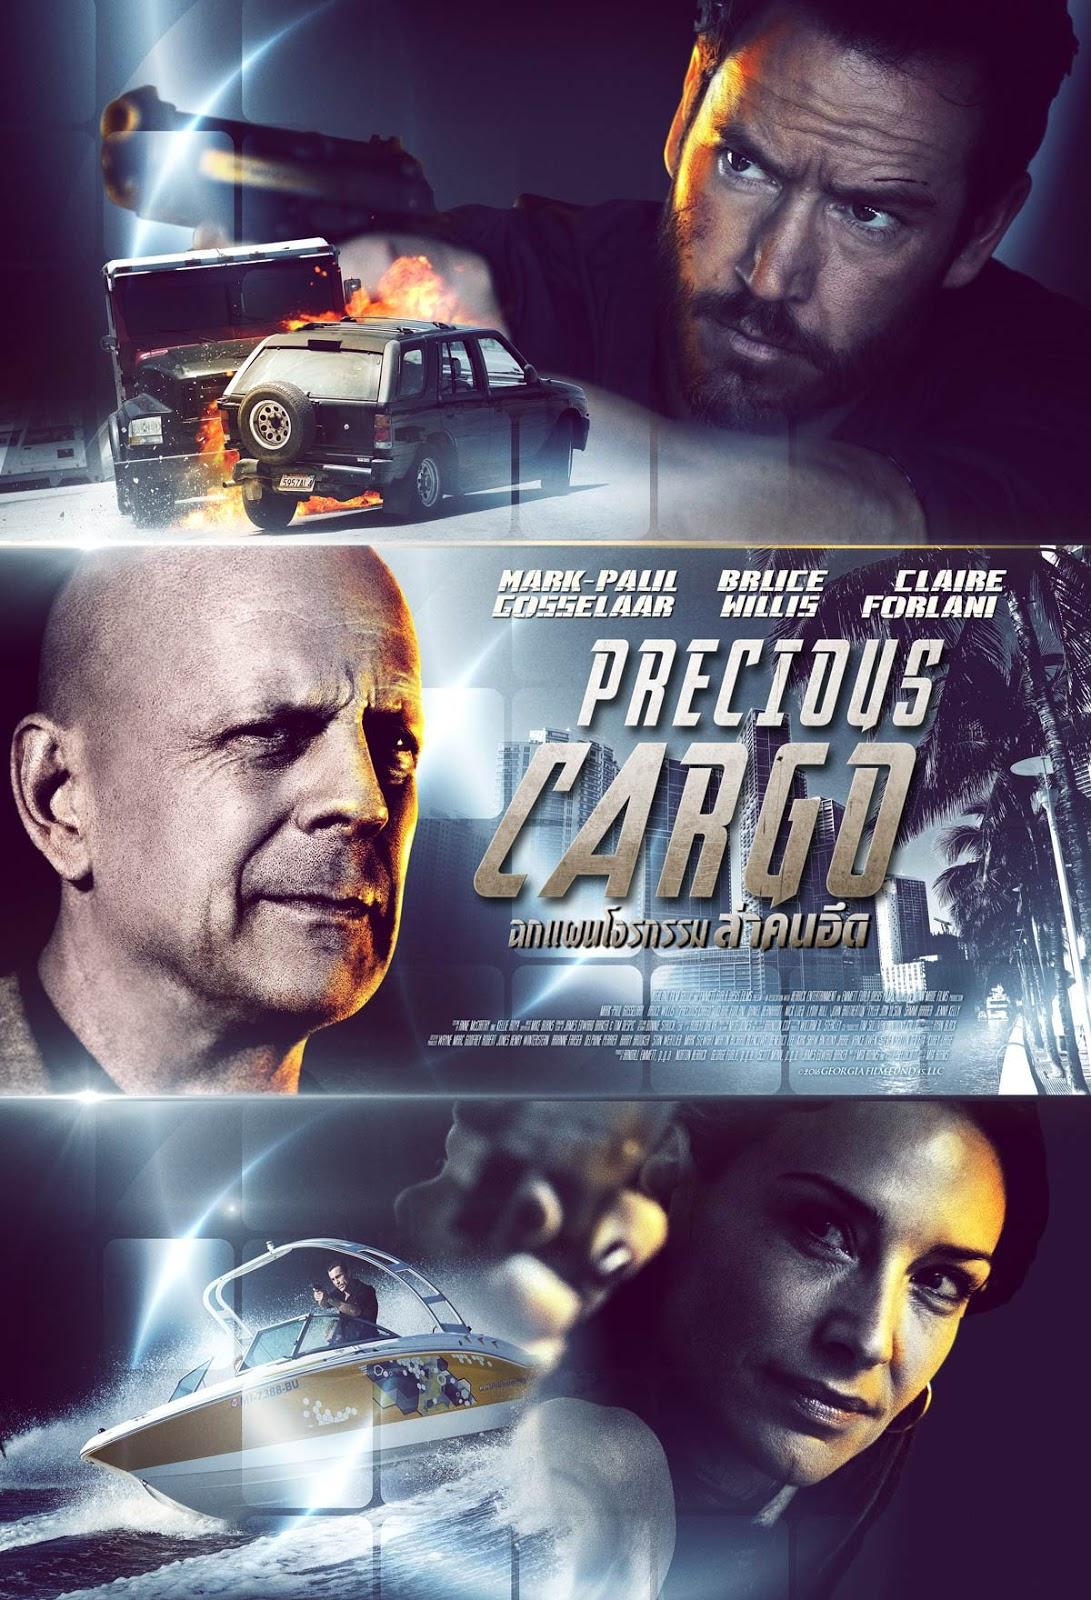 [MASTER มาใหม่] PRECIOUS CARGO (2016) ฉกแผนโจรกรรม ล่าคนอึด[1080P] [พากย์ไทย]